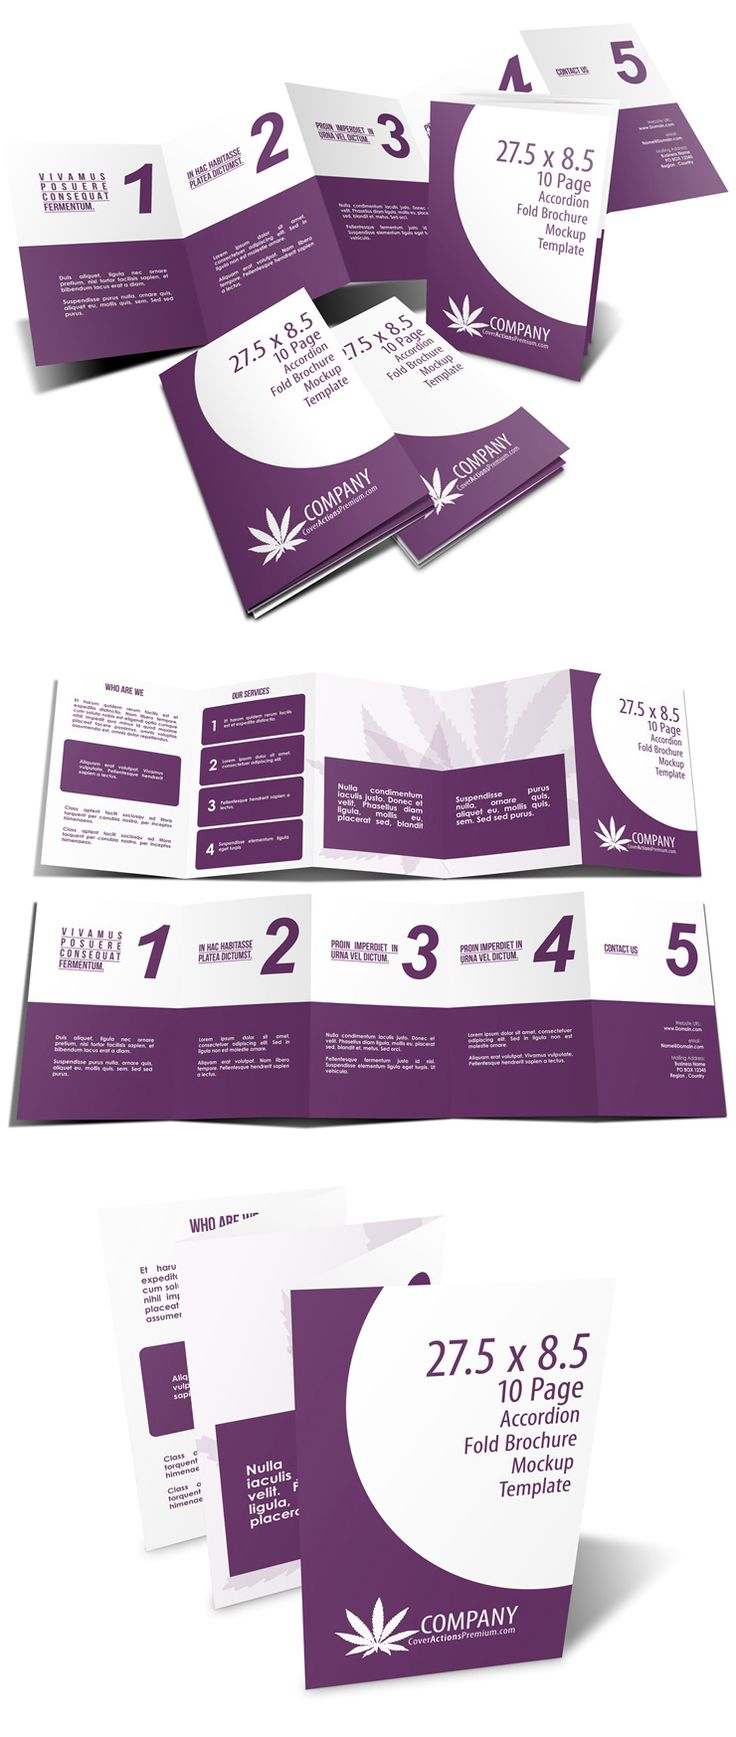 5 Panel 5.5 x 8.5 Accordion Fold Brochure Mockup